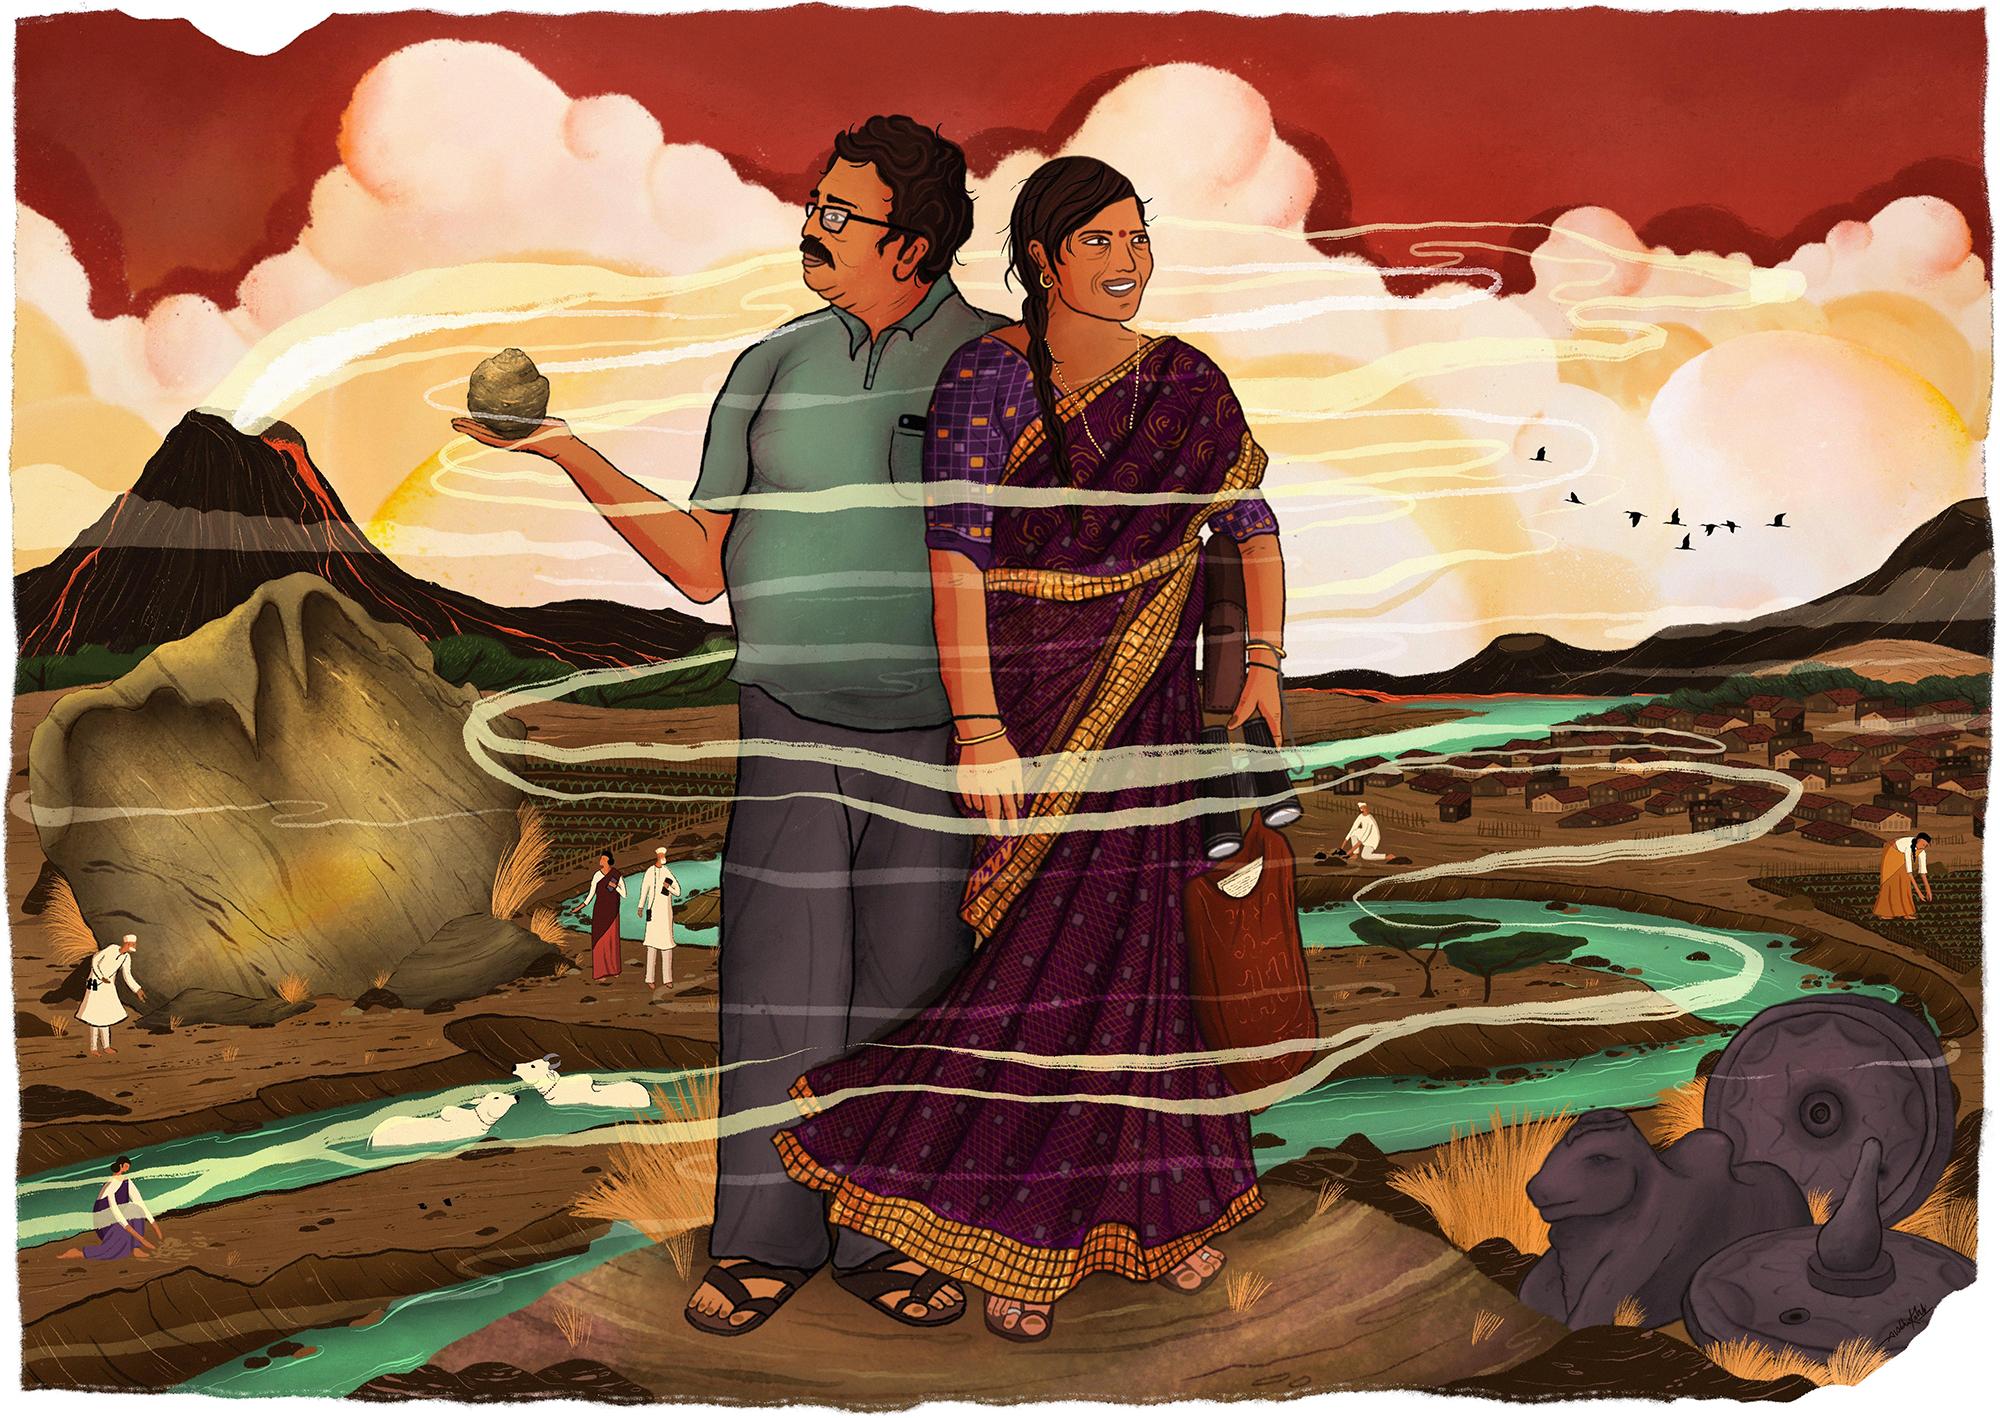 Wetland Champions: Pushpa and Amol Korde from Bori Budruk are leading efforts to preserve a unique geomorphological feature on the Kukadi river bed. Illustration by Svabhu Kohli for Mongabay.